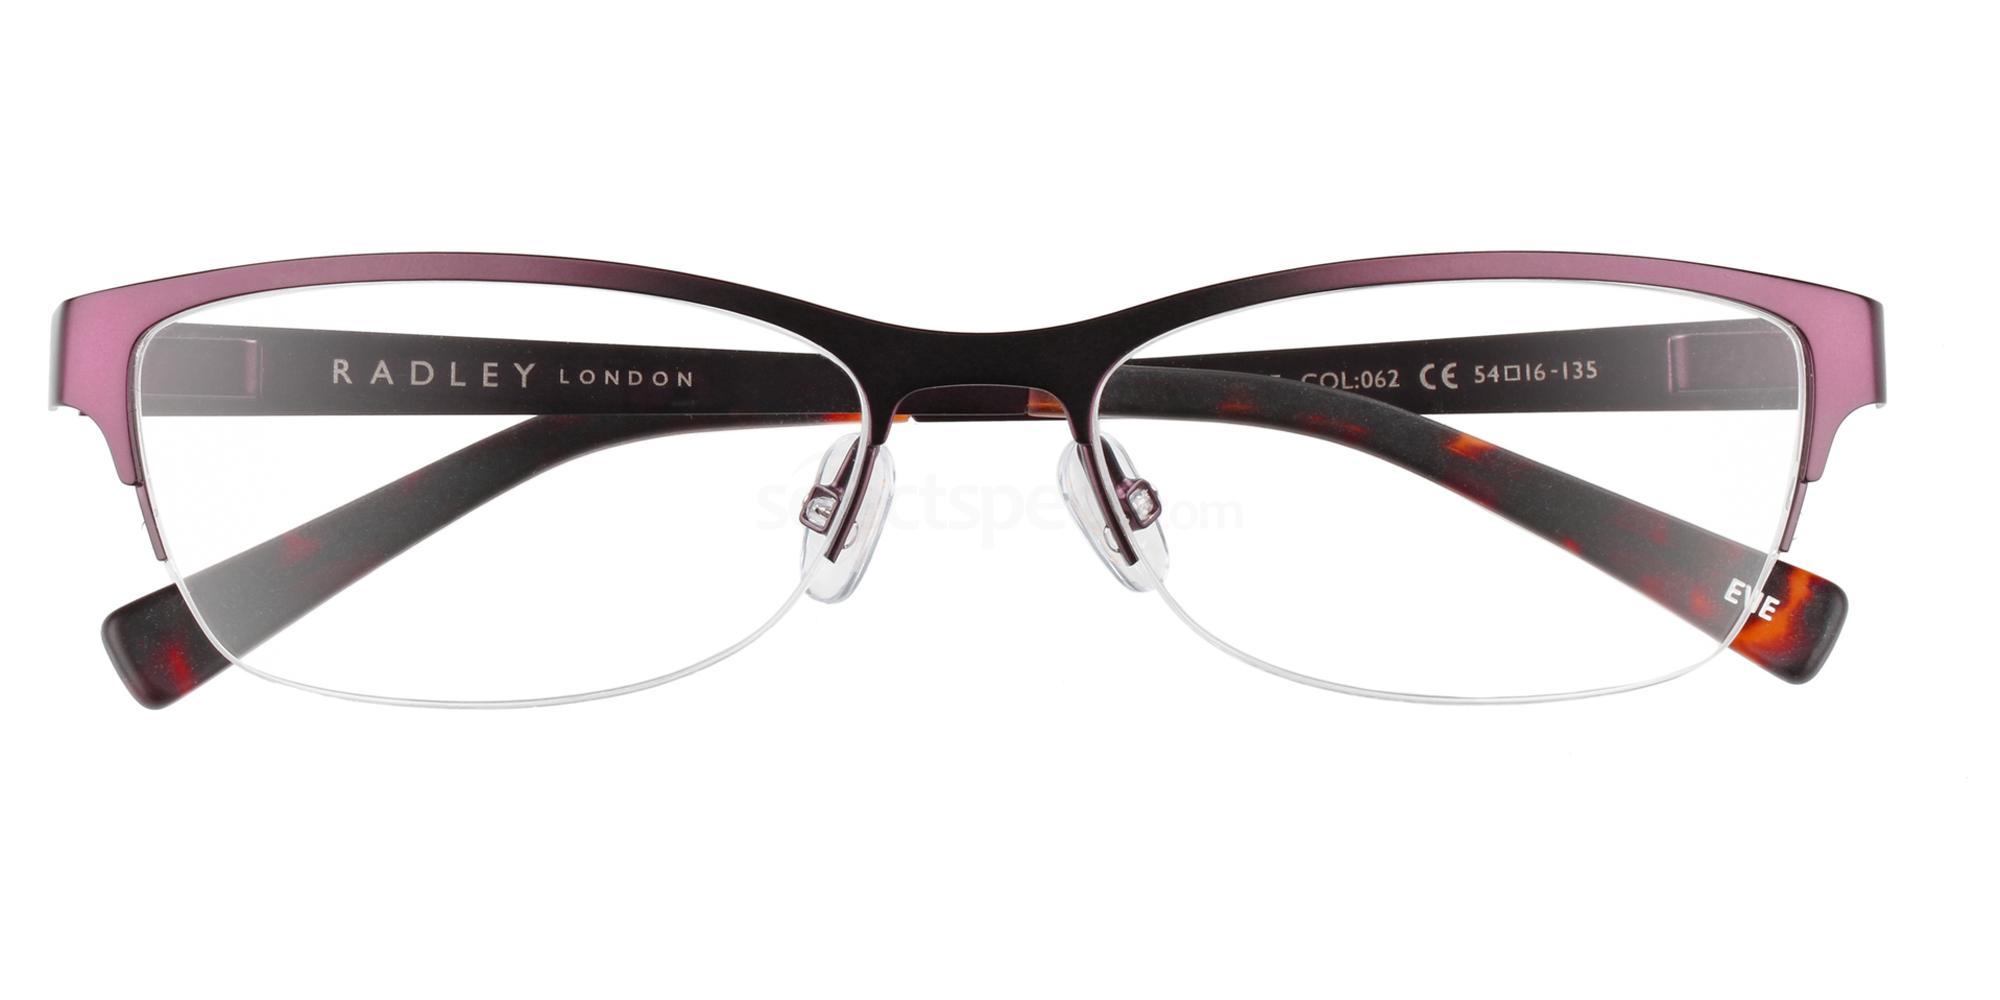 062 RDO-EVIE Glasses, Radley London